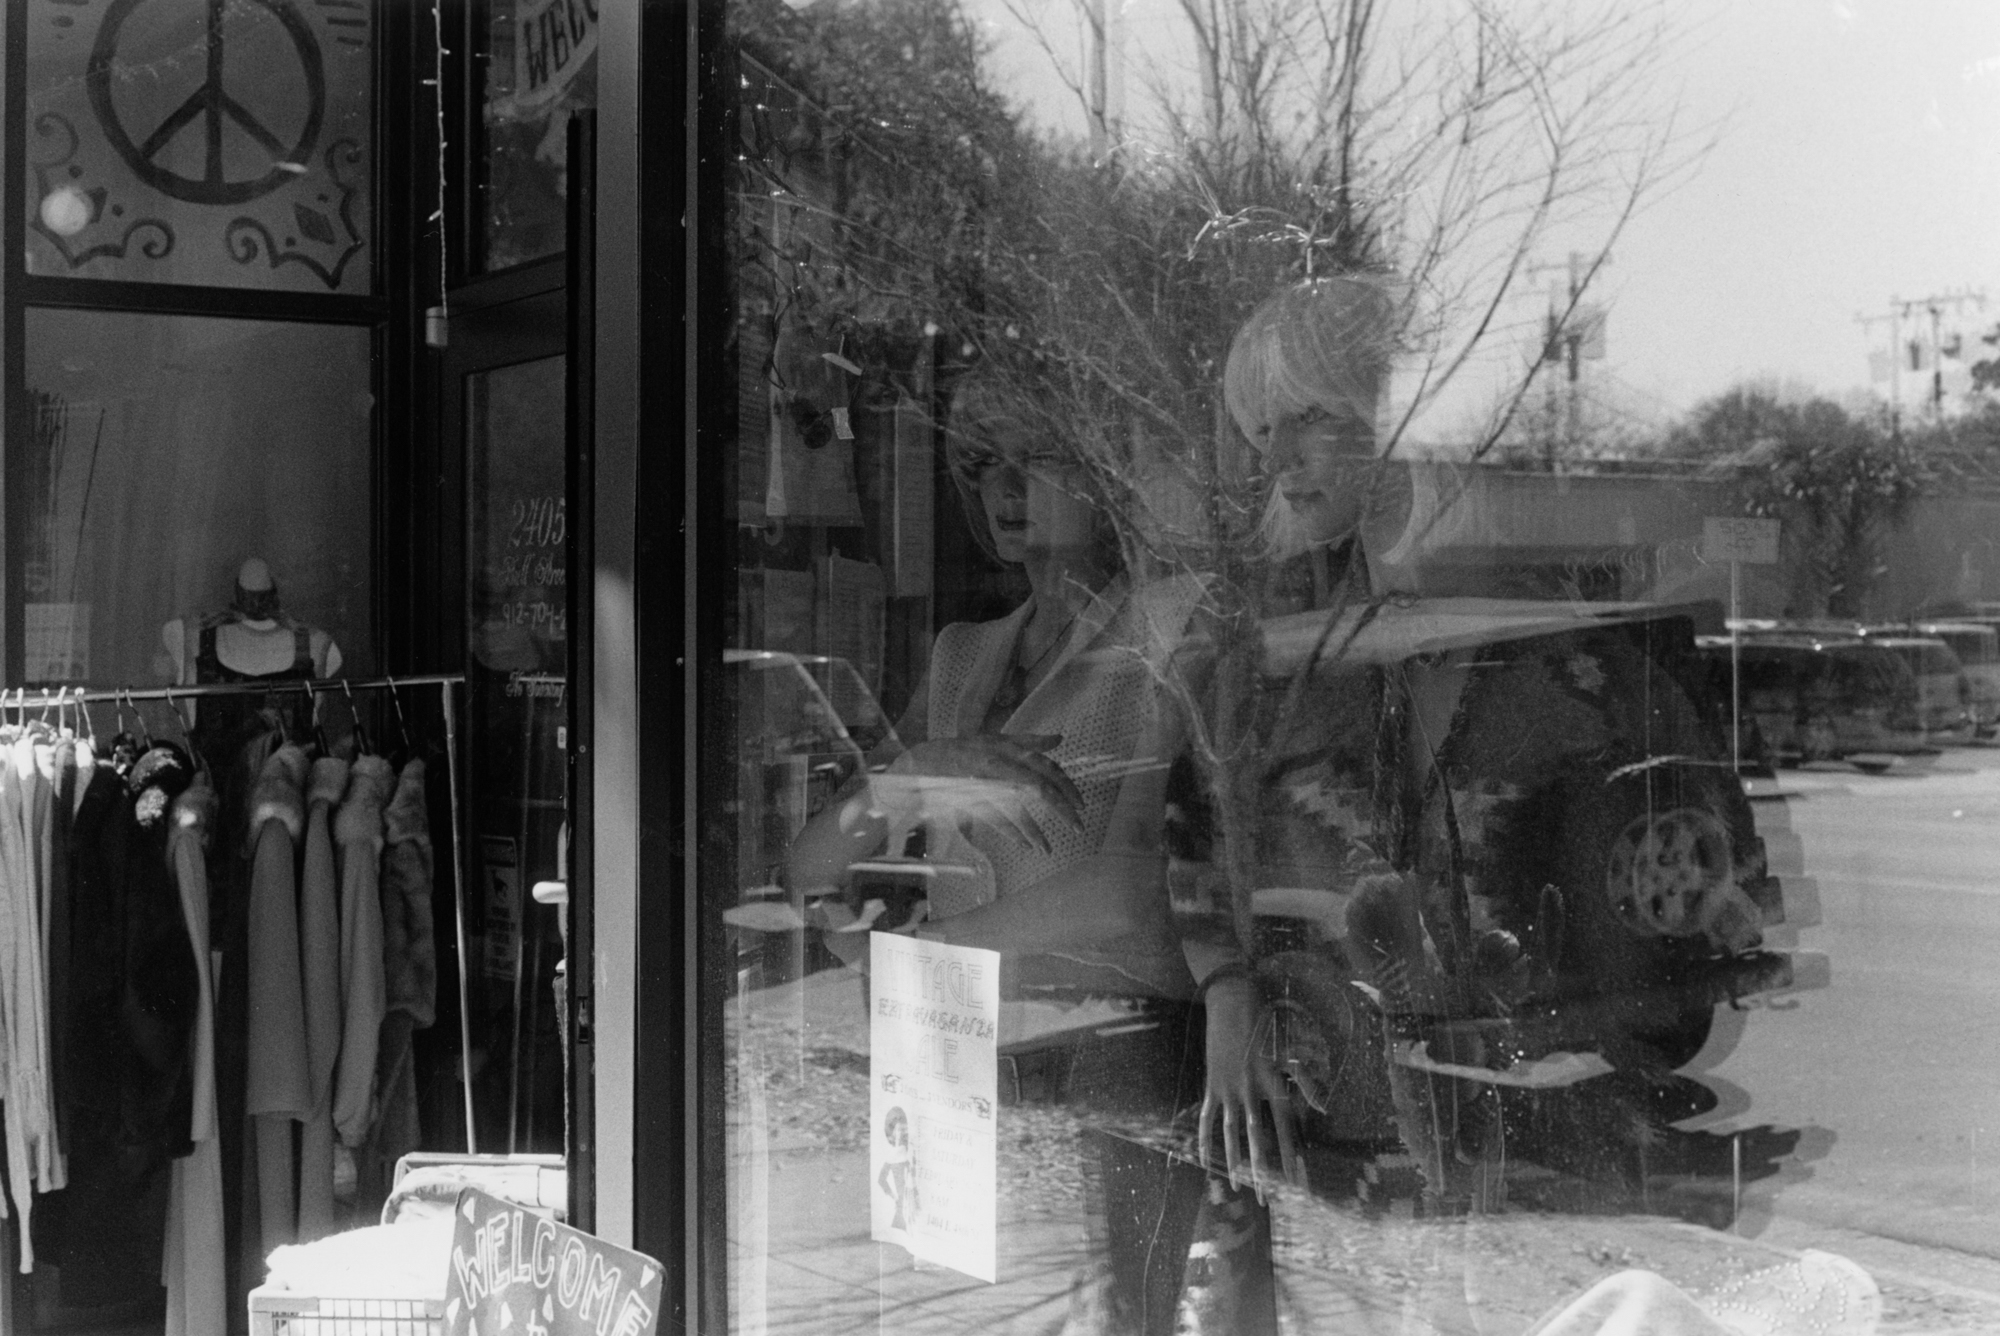 Penelope_Stone-Window_Shopping-5.jpg